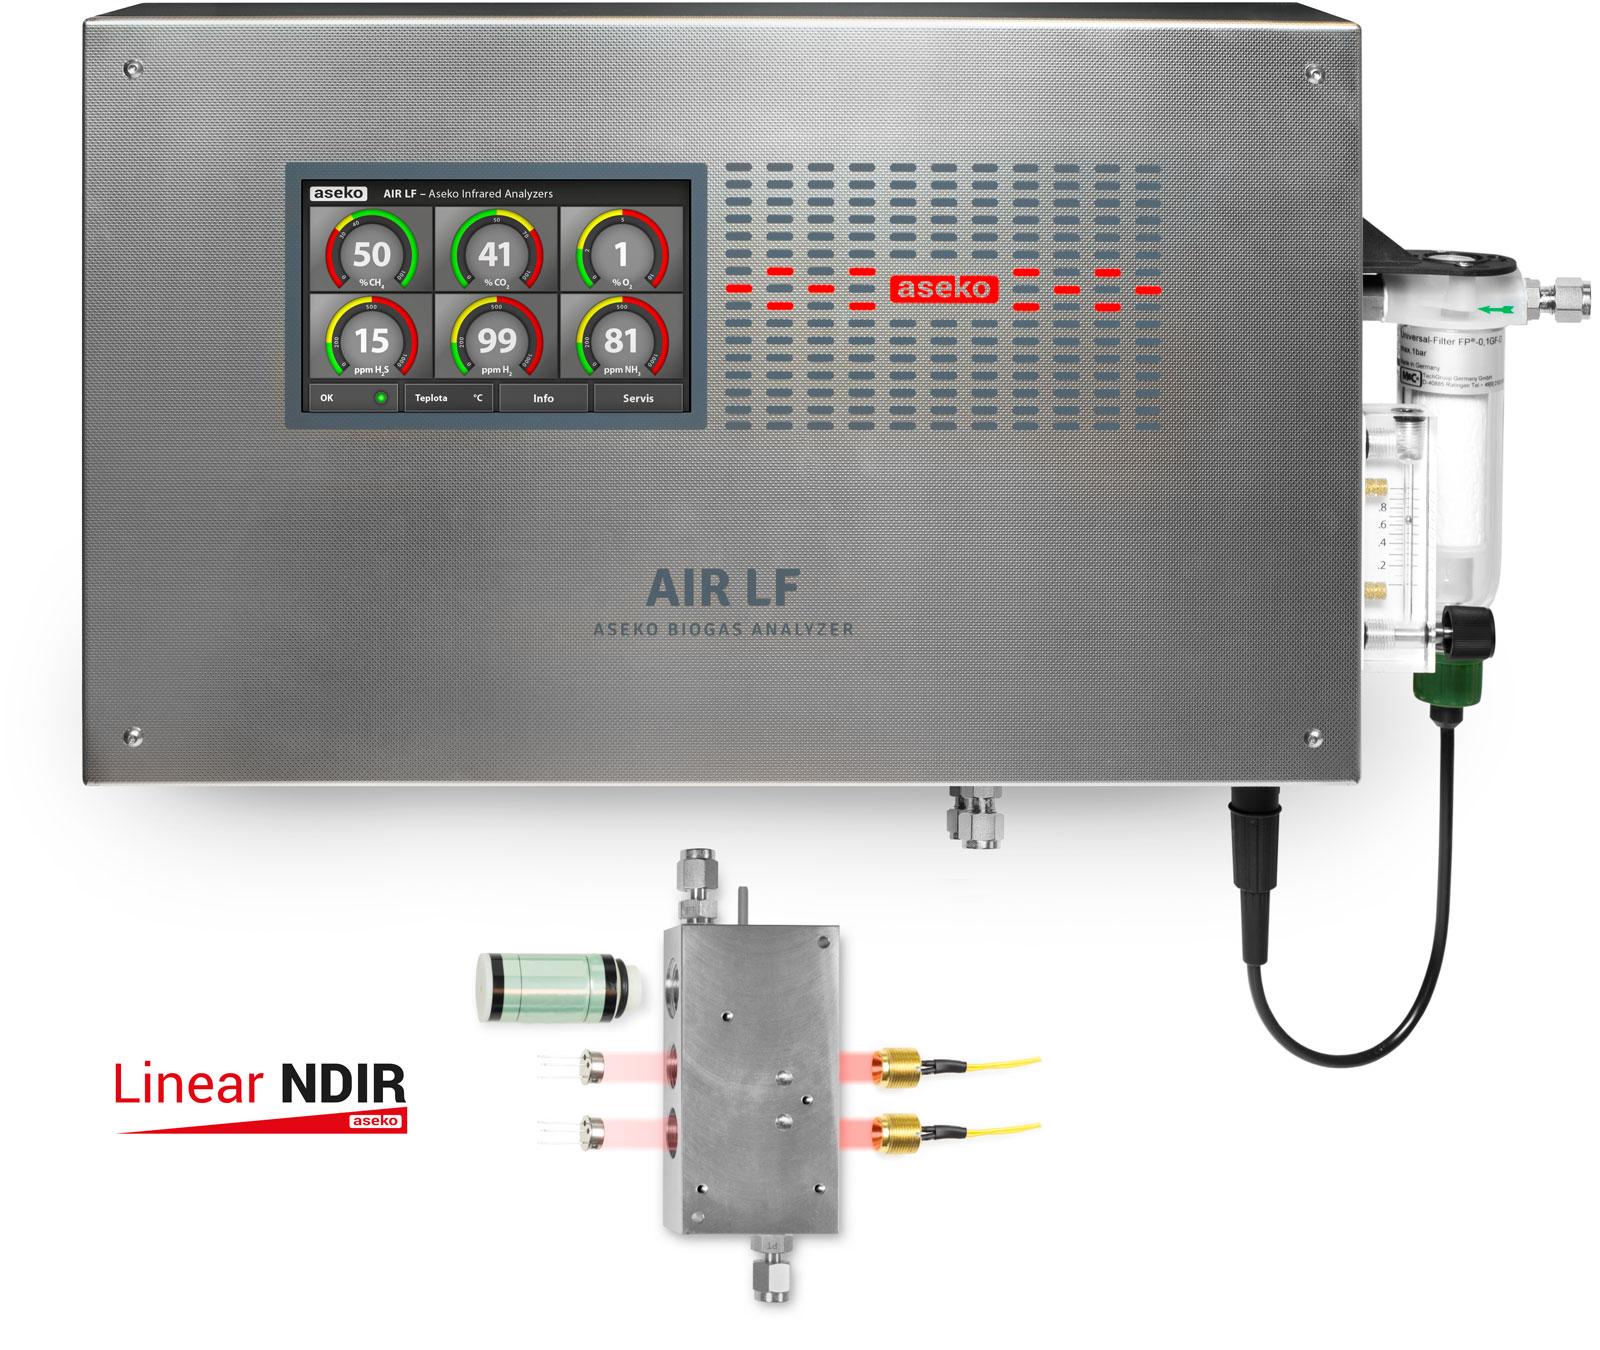 AIR-LF-2014-ndir